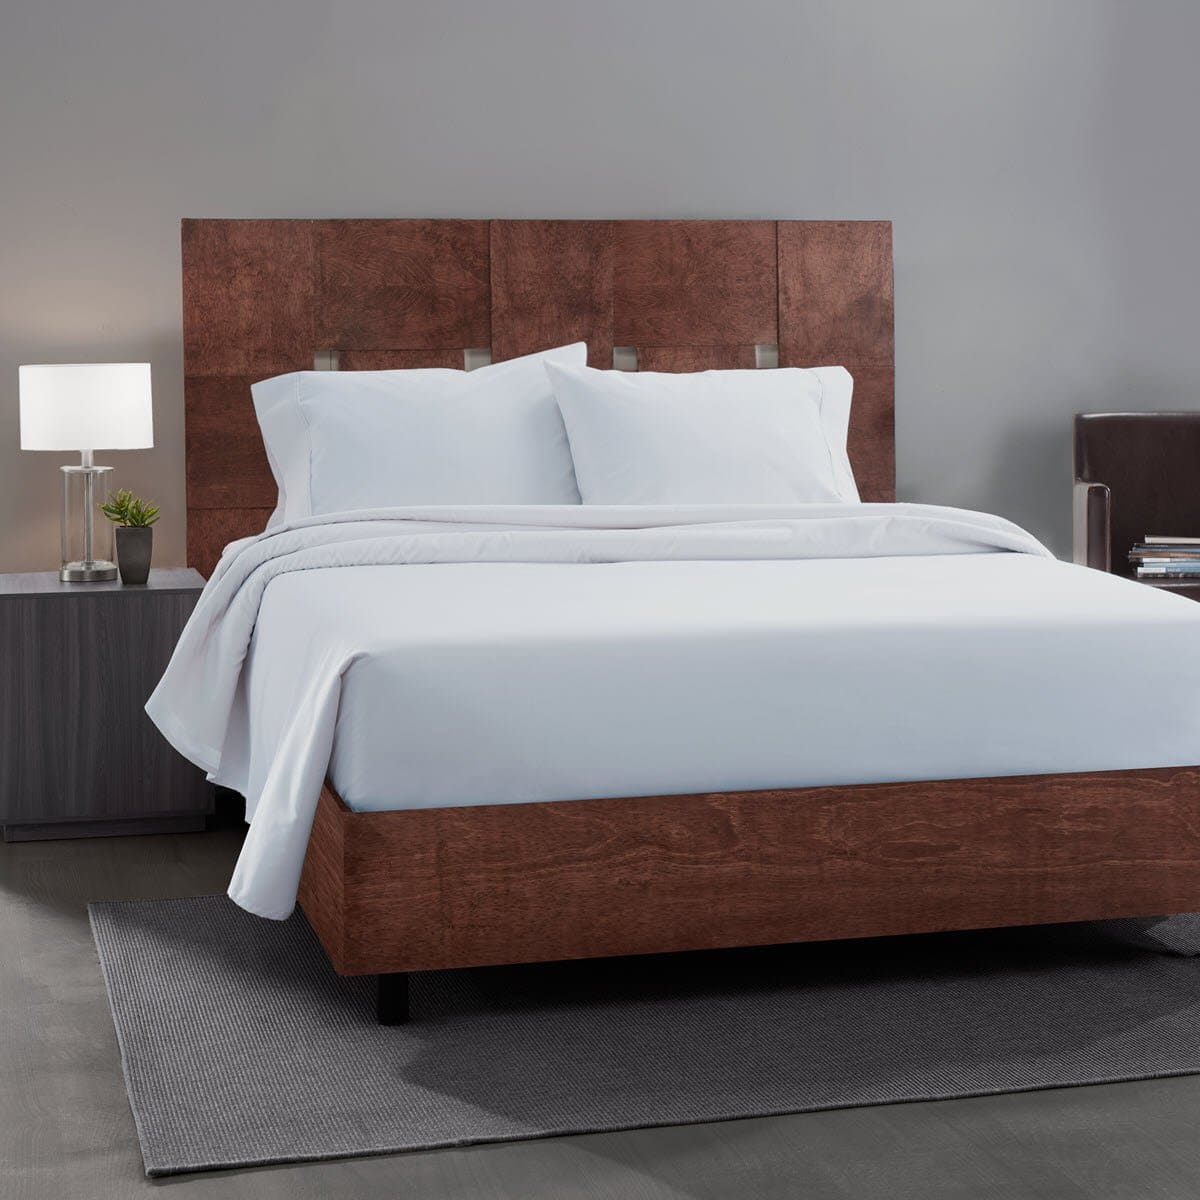 sleepletics bed